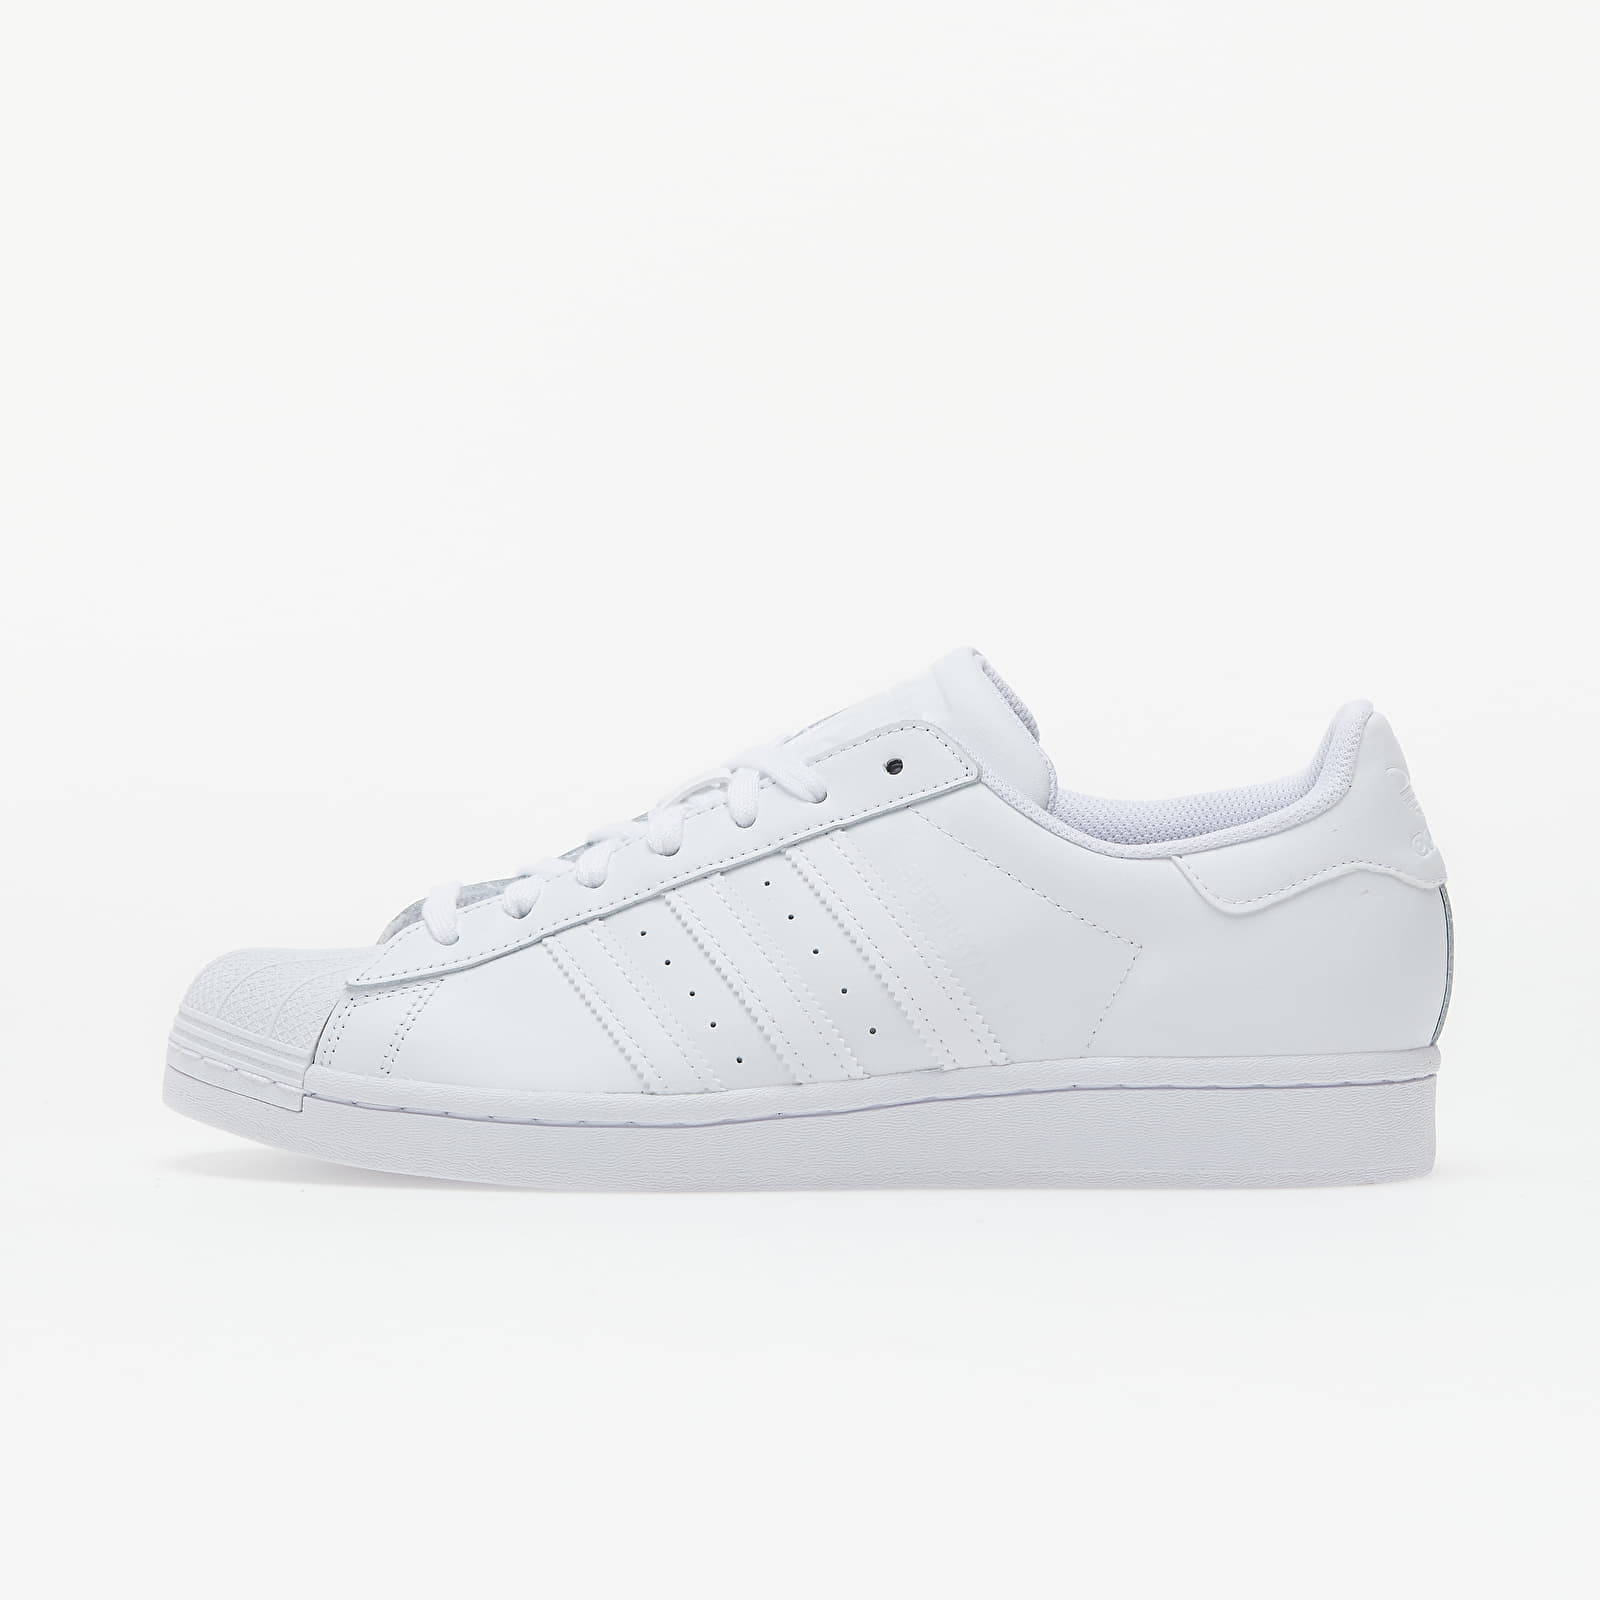 adidas Superstar Ftw White/ Ftw White/ Ftw White EUR 47 1/3